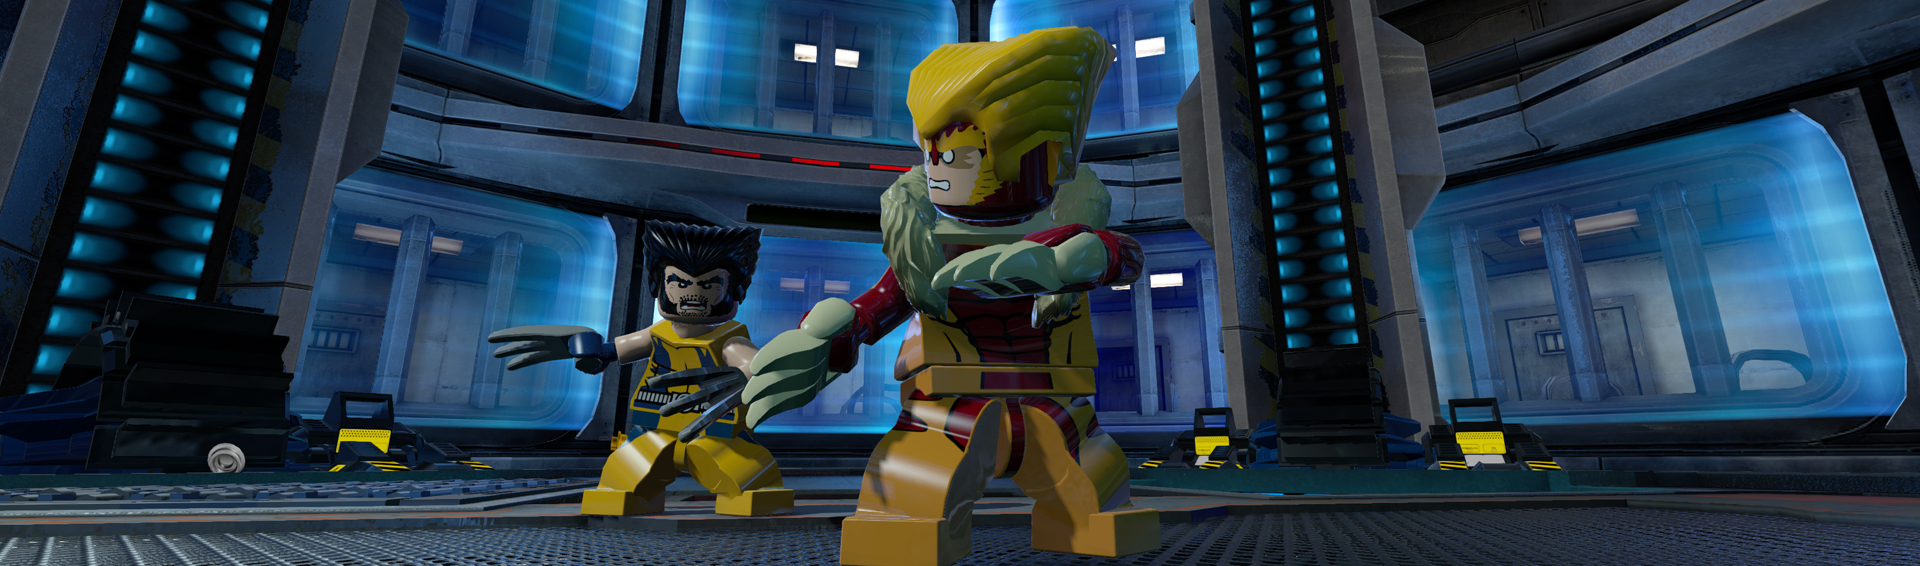 Imagenes De Lego Marvel Super Heroes Meristation